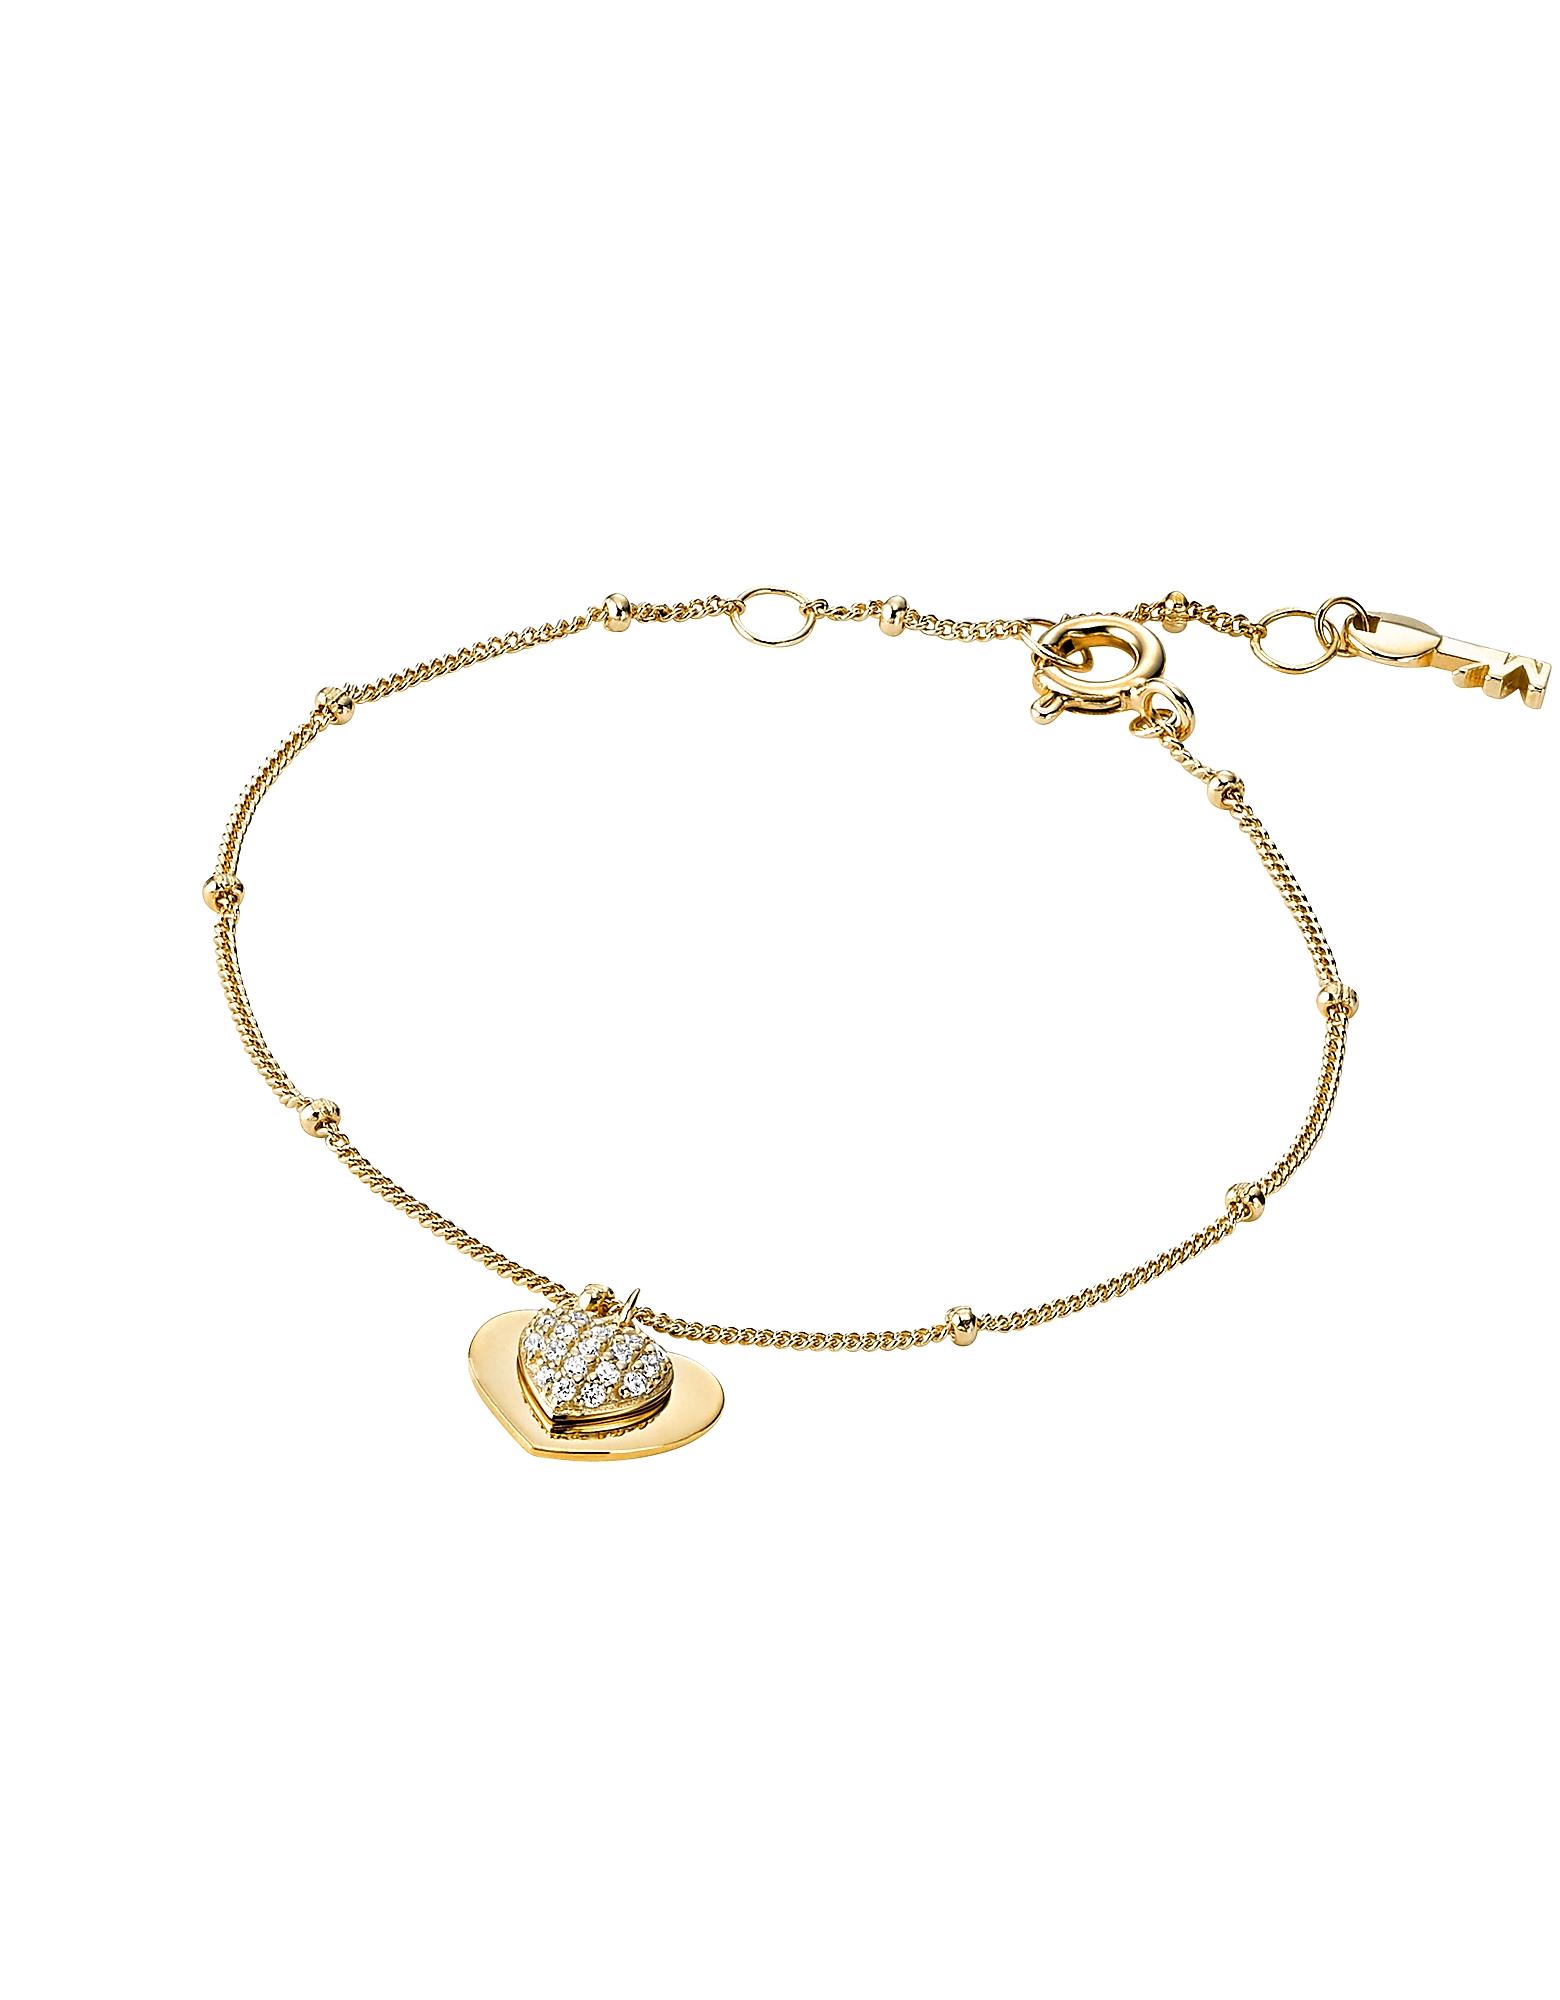 Kors Love 14K Gold Plated Sterling Silver Pavé Heart Bracelet